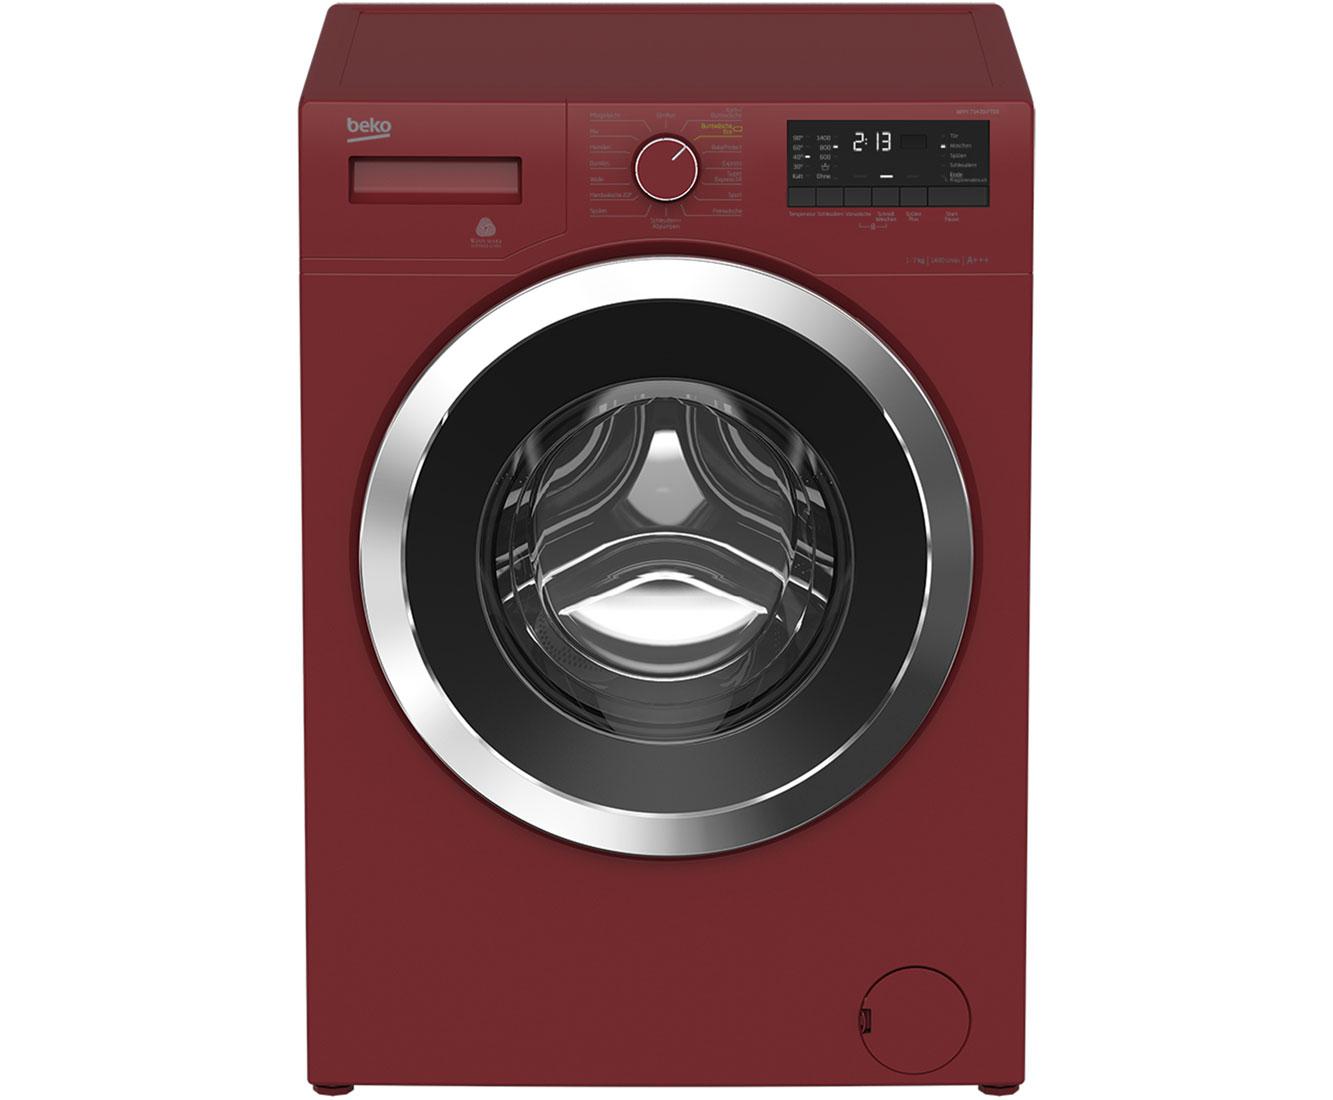 beko wmy 71433 pter waschmaschine a 1400 upm 7 kg watersafe mengenautomatik. Black Bedroom Furniture Sets. Home Design Ideas